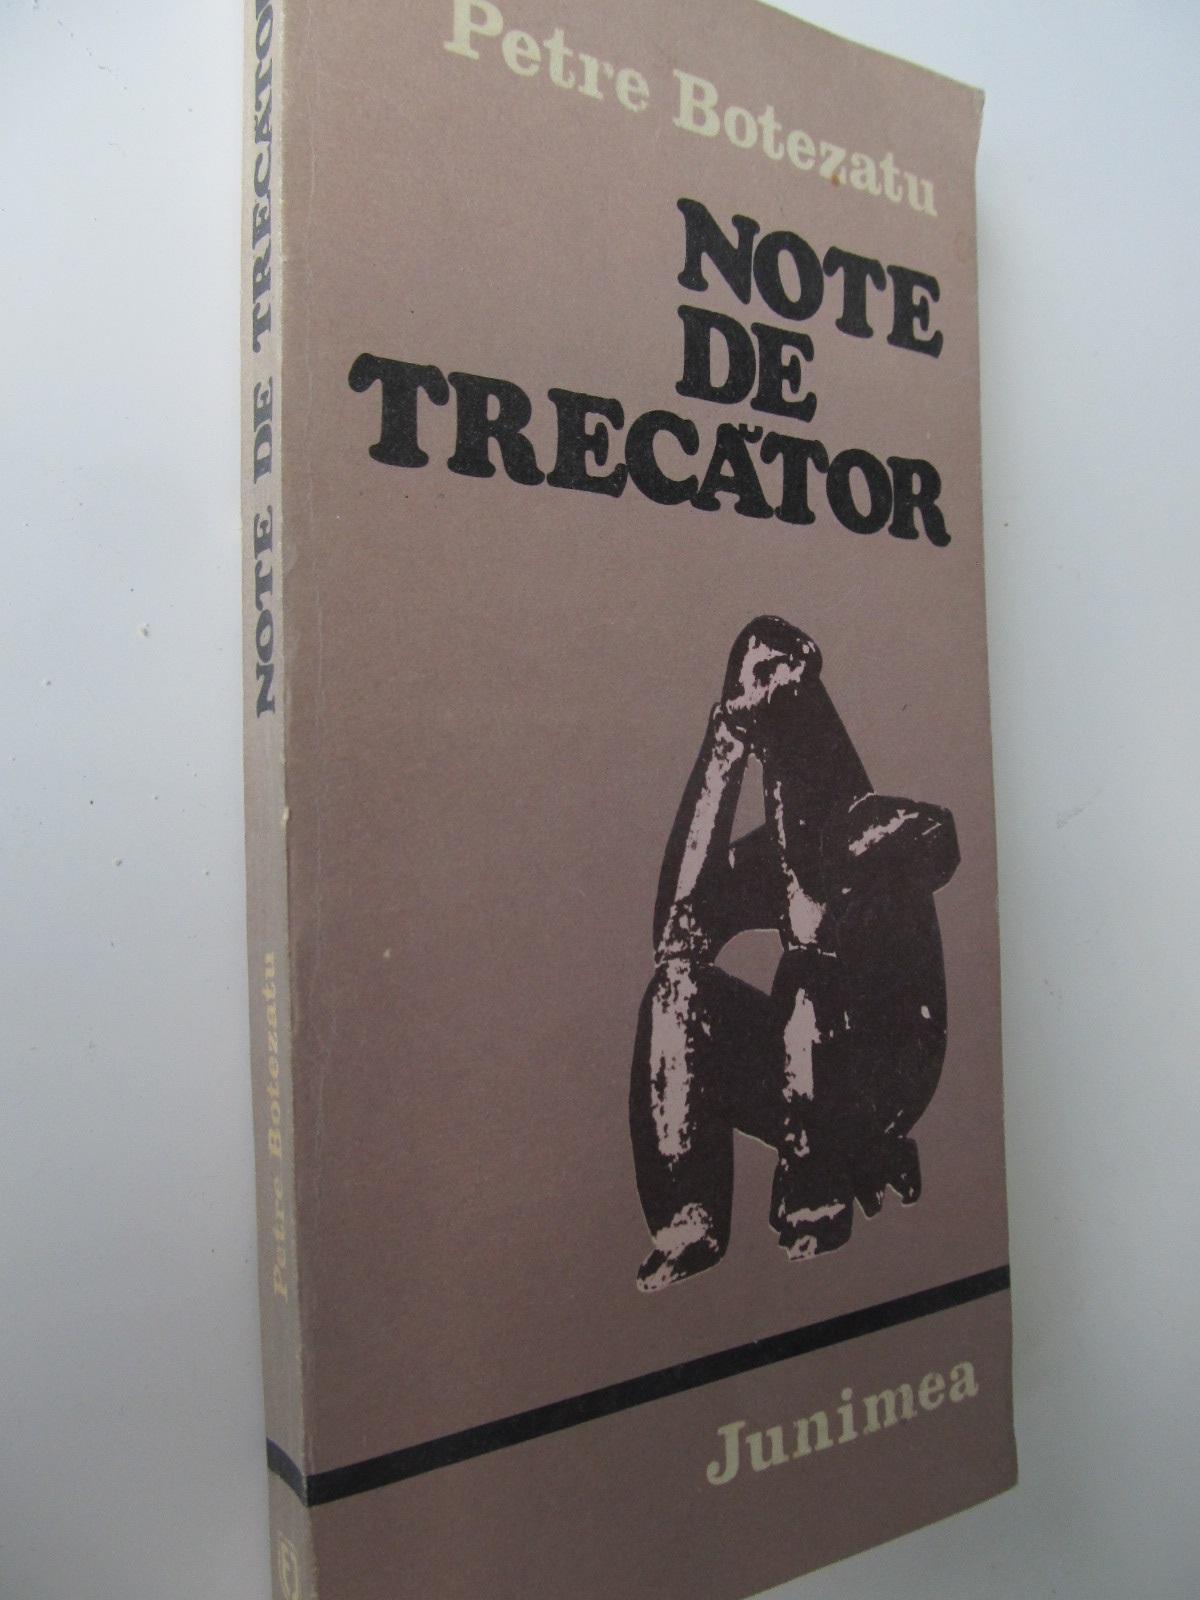 Note de trecator - Petre Botezatu | Detalii carte